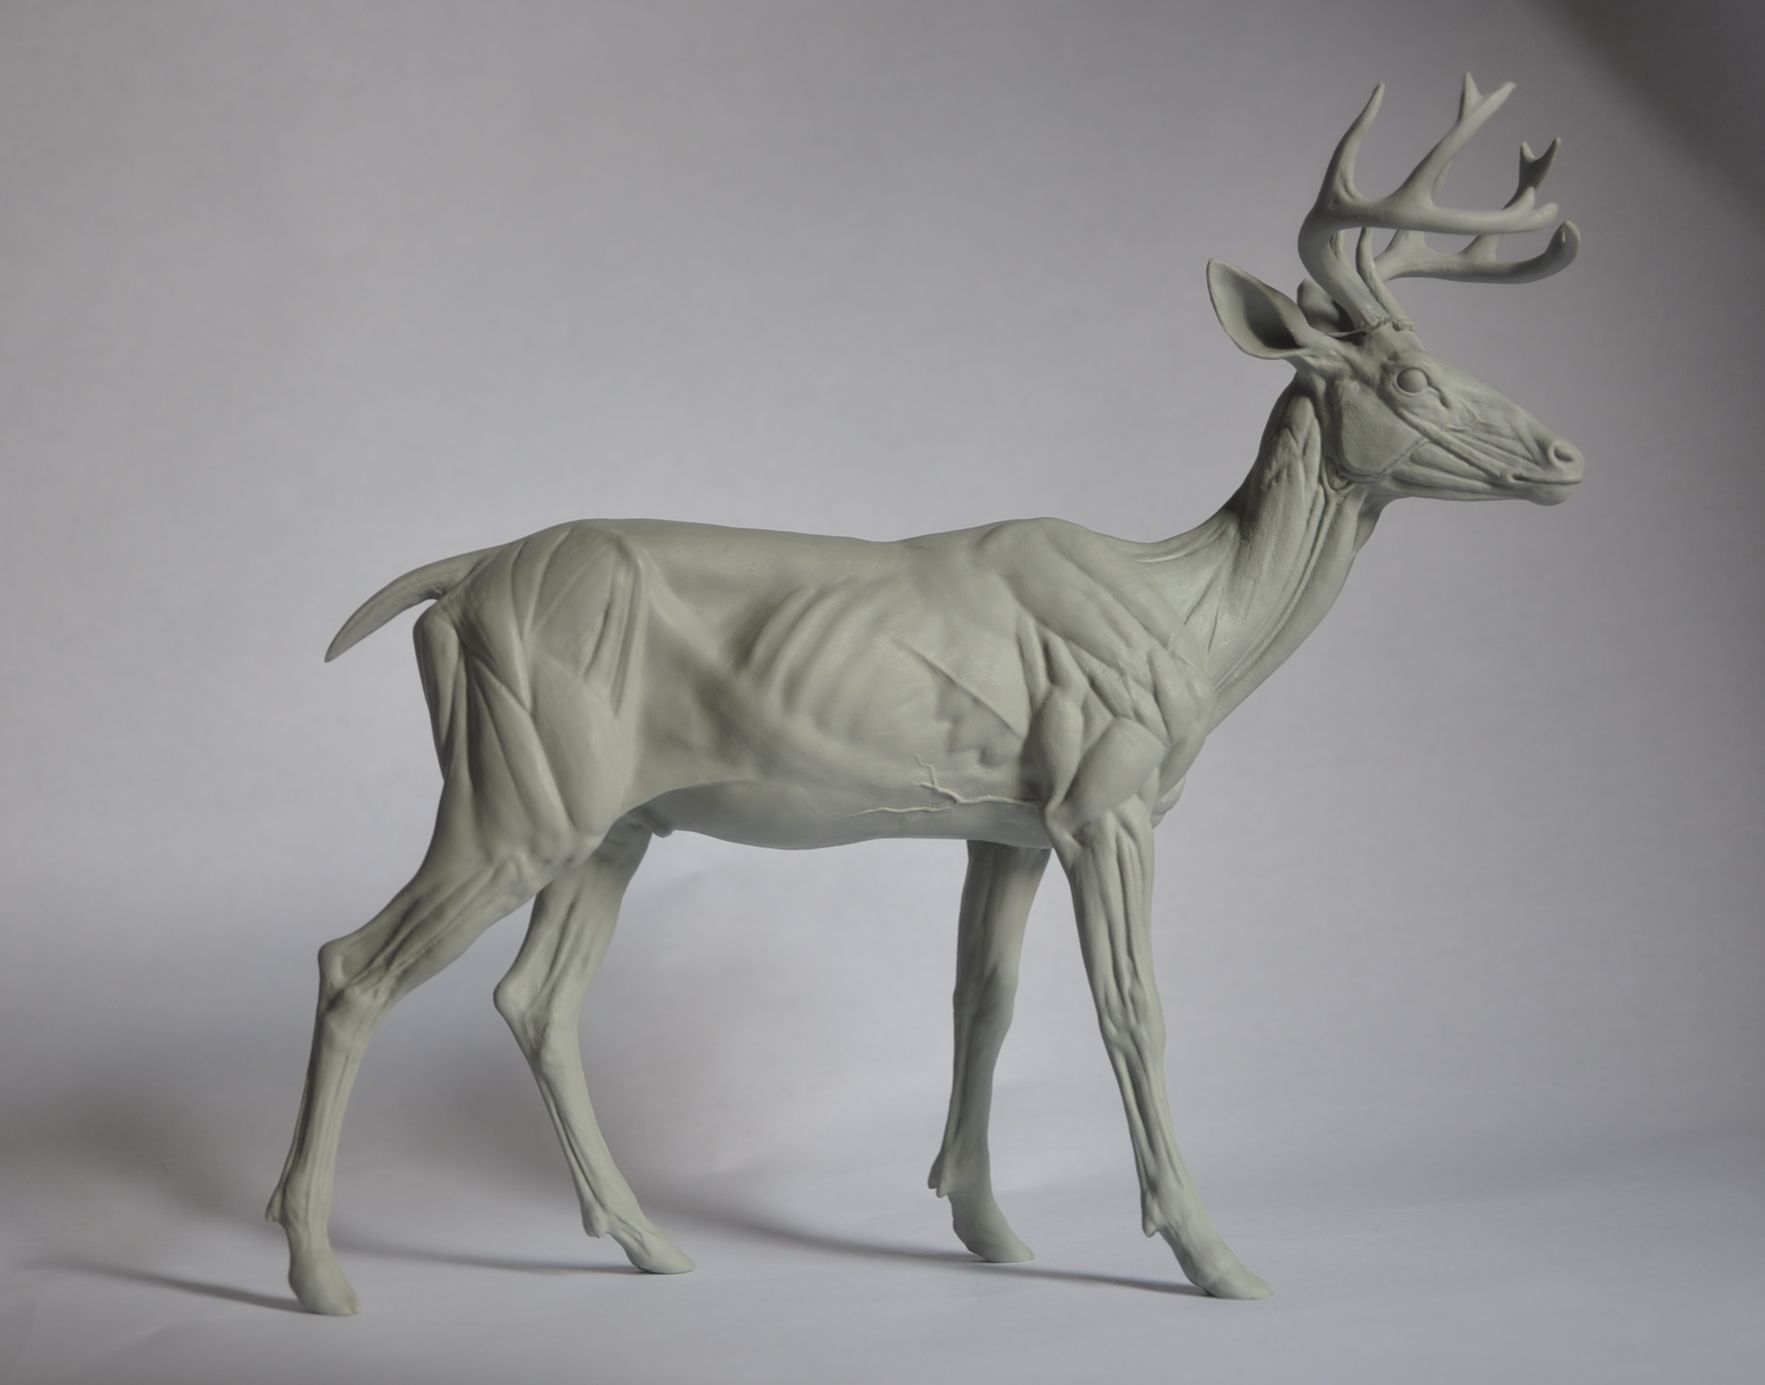 White-tailed Deer Anatomy Study | fine. ART | Pinterest | White ...